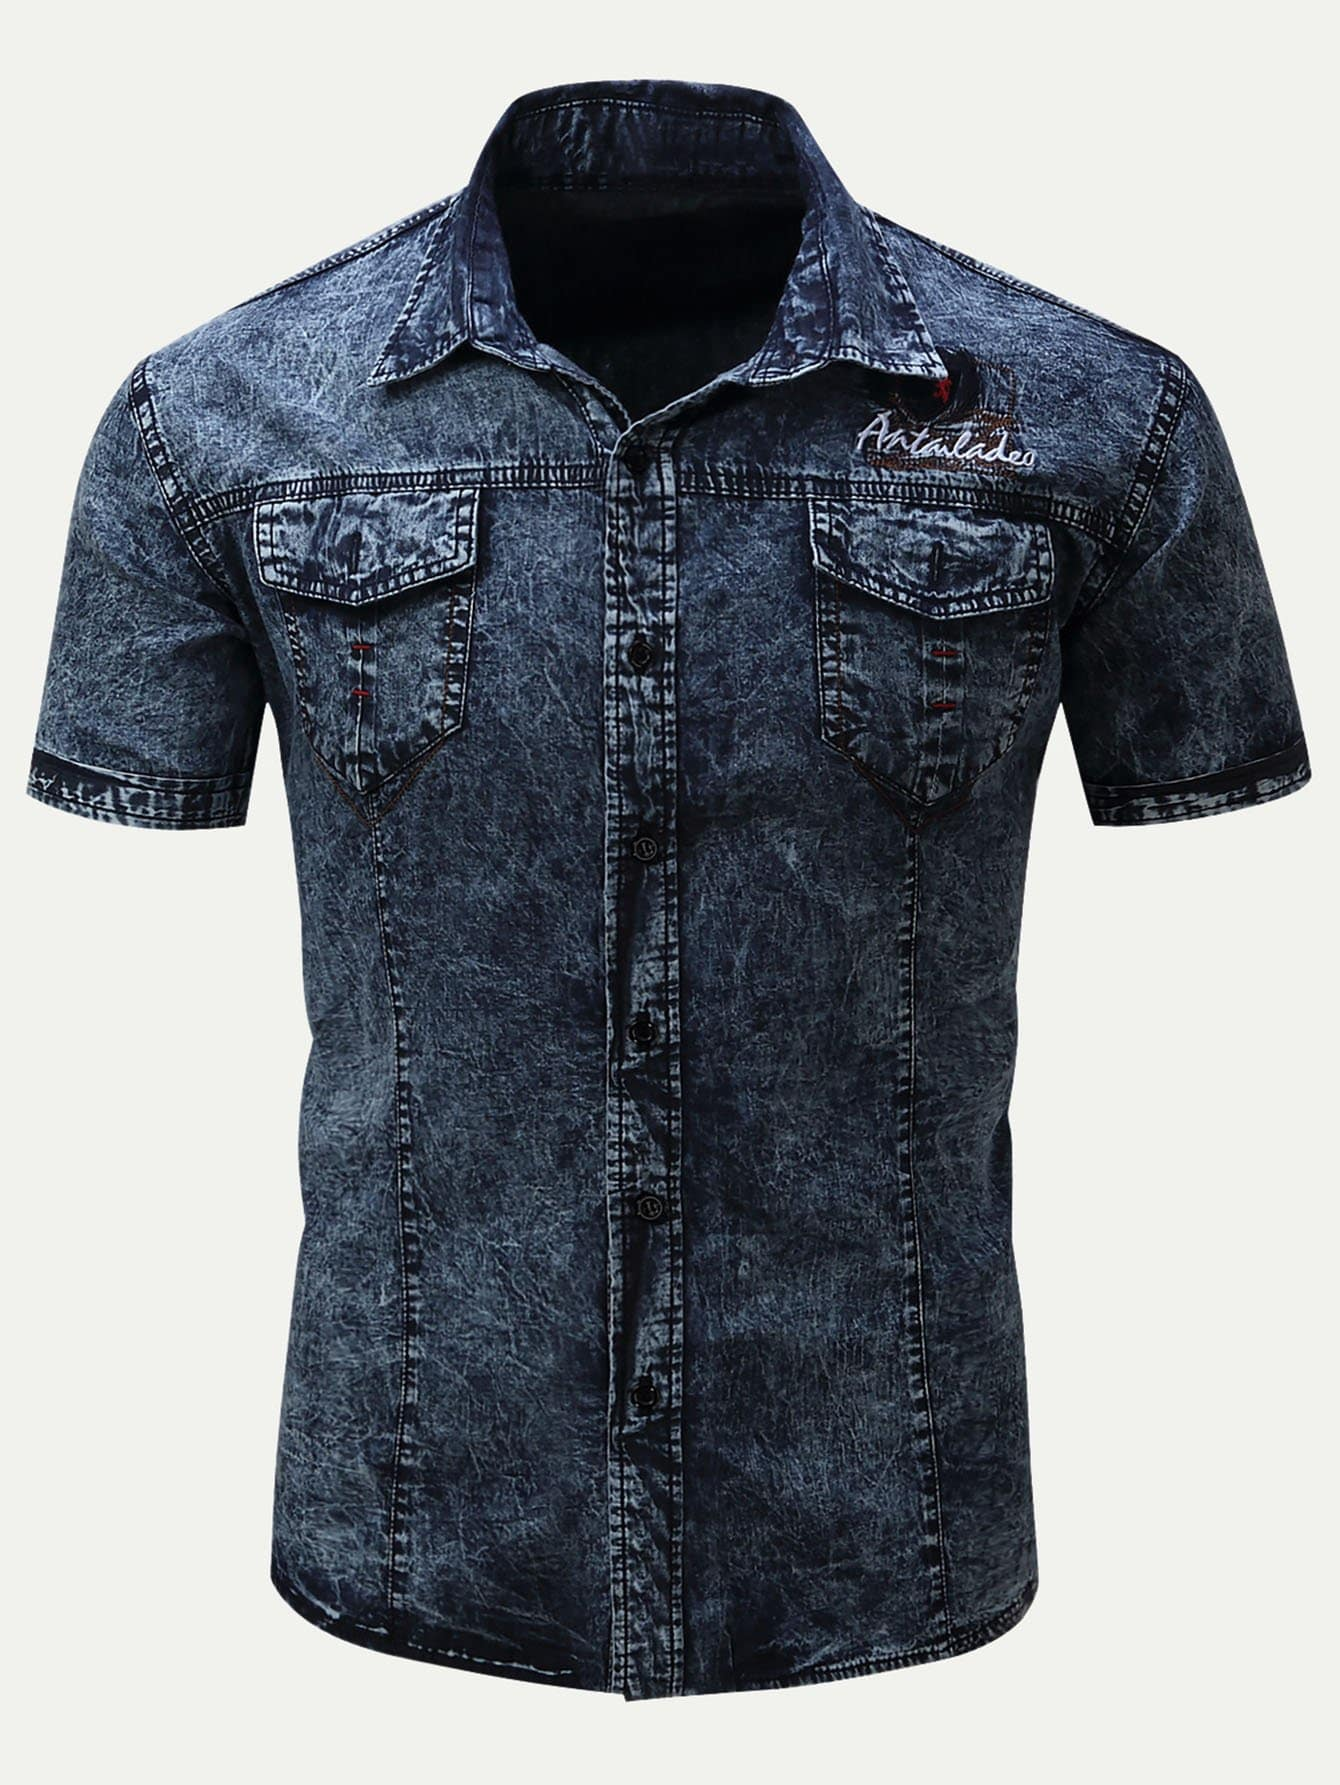 Men Letter Print Embroidery Denim Shirt men letter embroidery side jeans